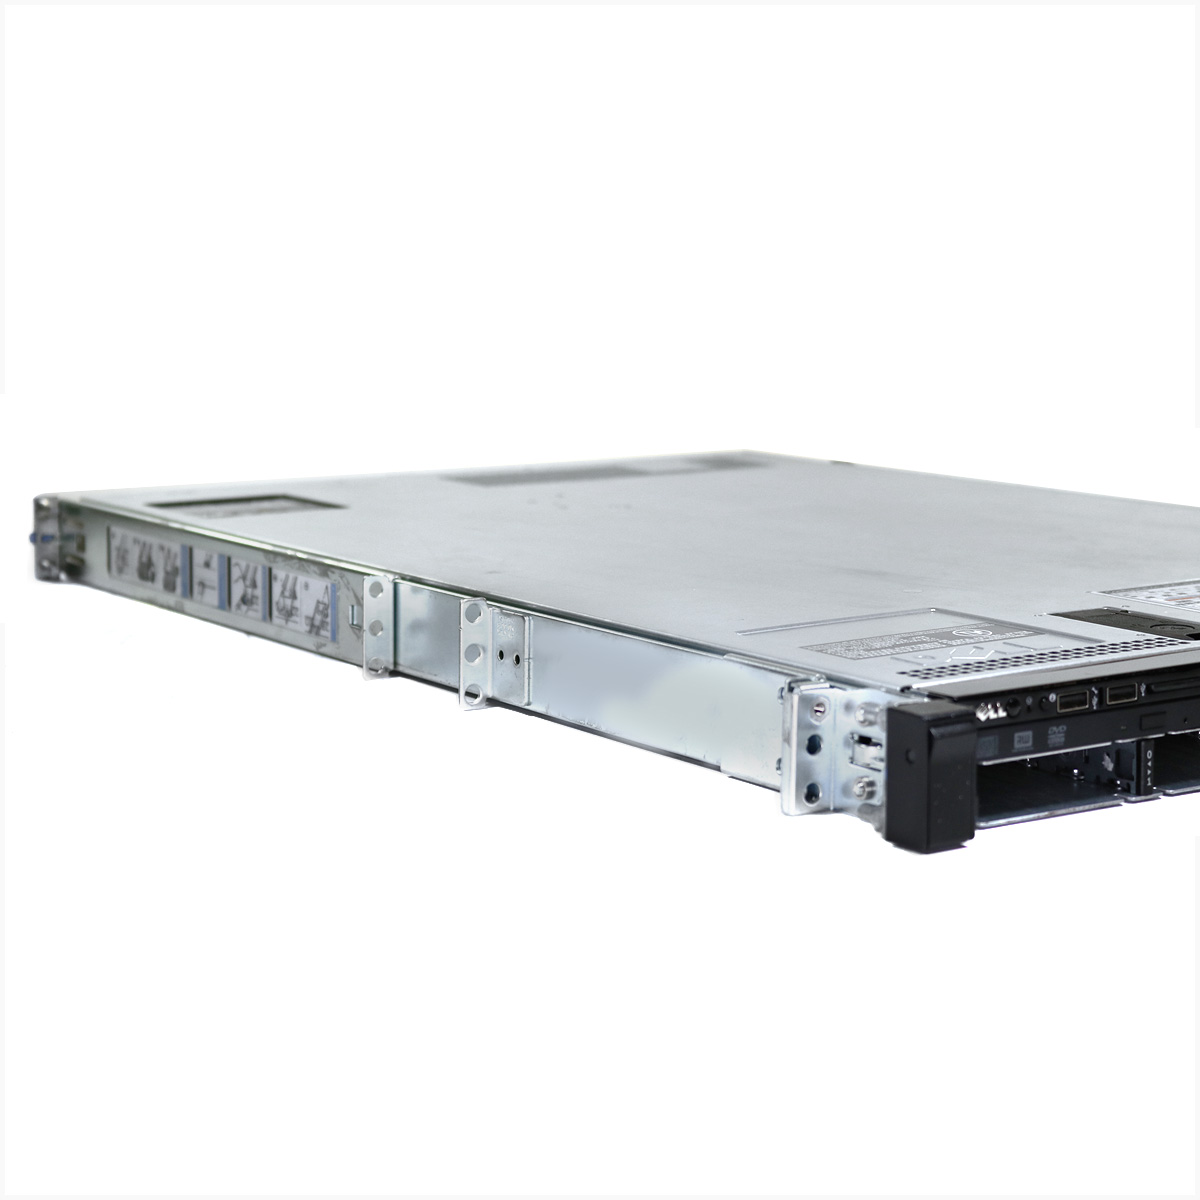 Servidor dell r630 xeon e5-2650 v3 128gb 2x 1tb sas - usado